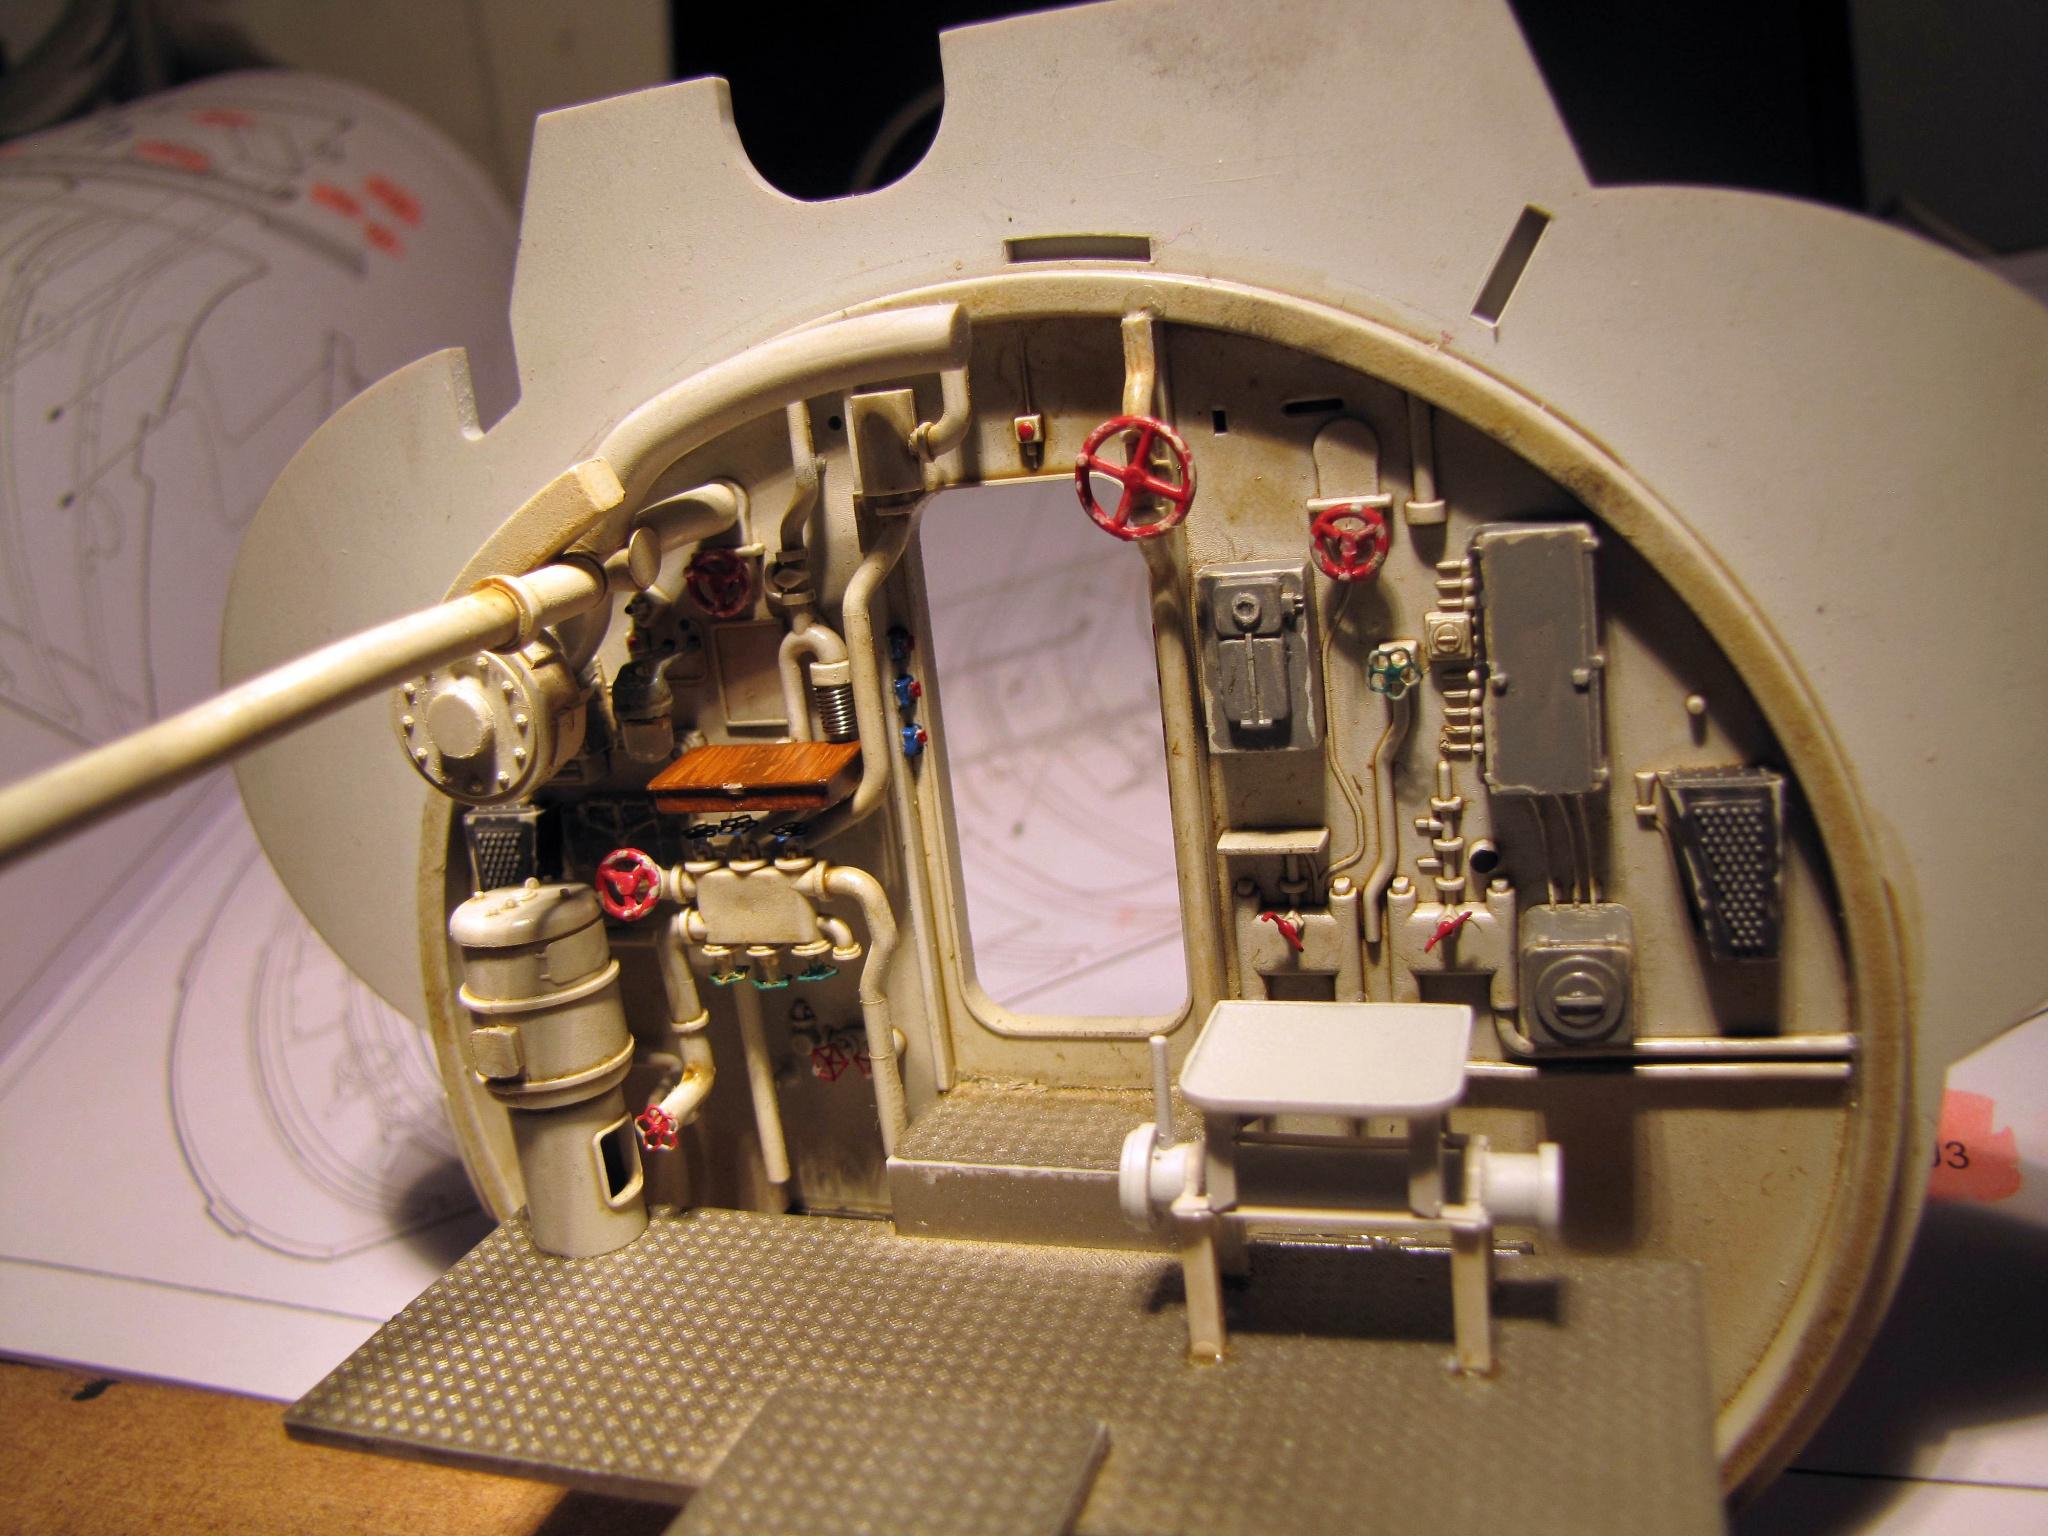 U-552 TRUMPETER Echelle 1/48 - Page 3 813965zzb